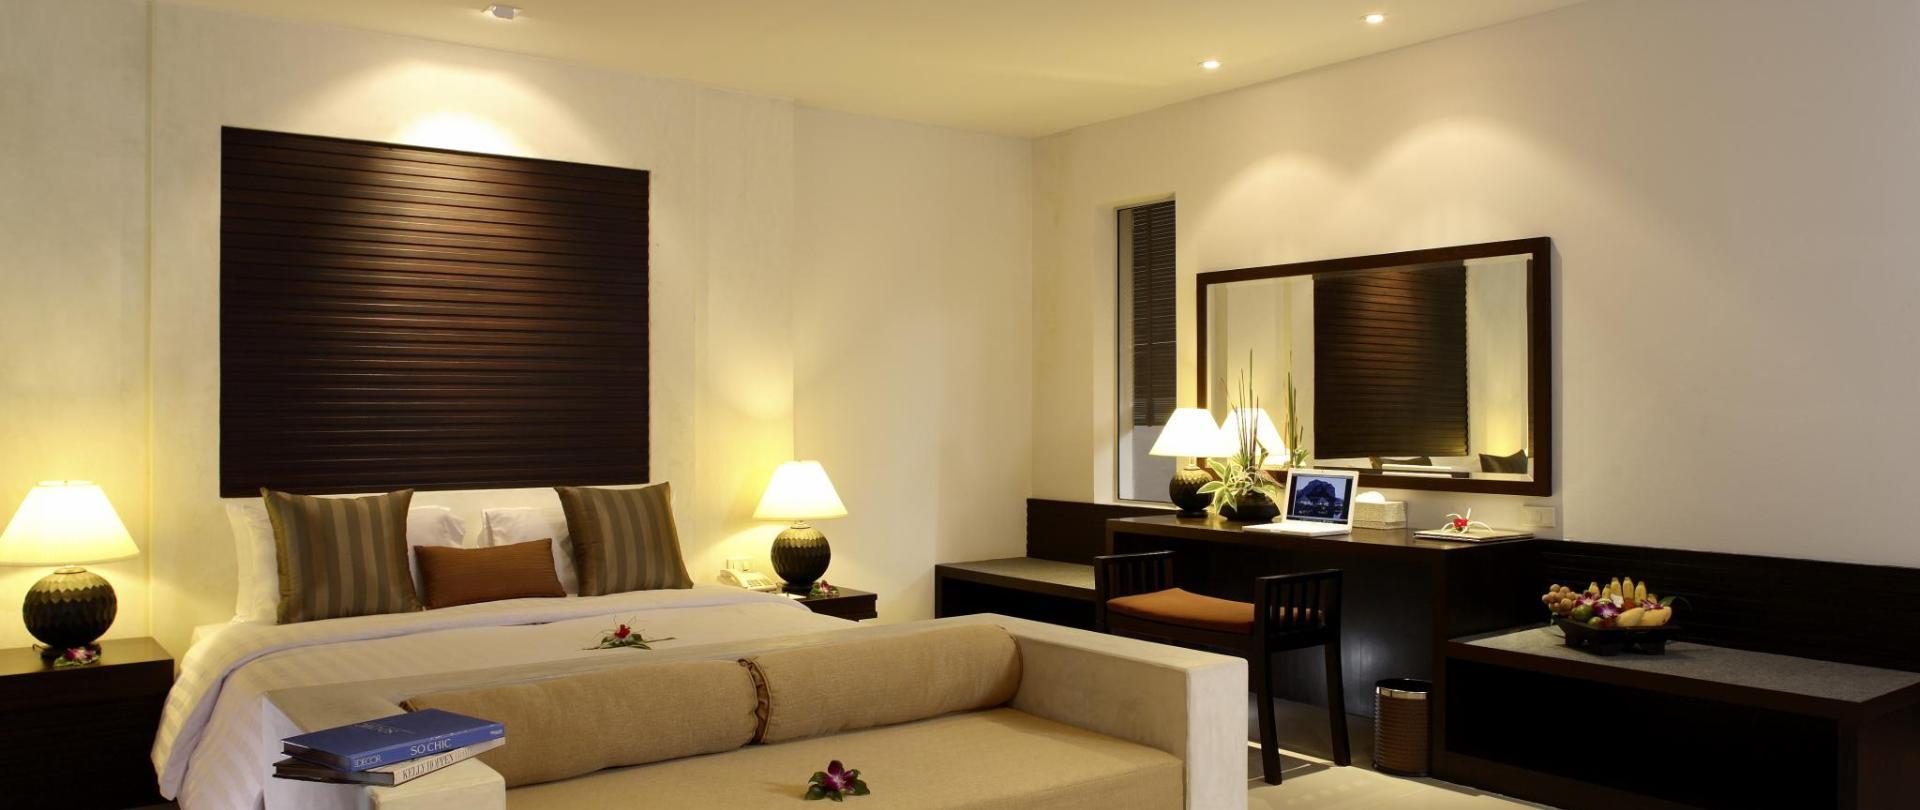 Superior Room 1.JPG